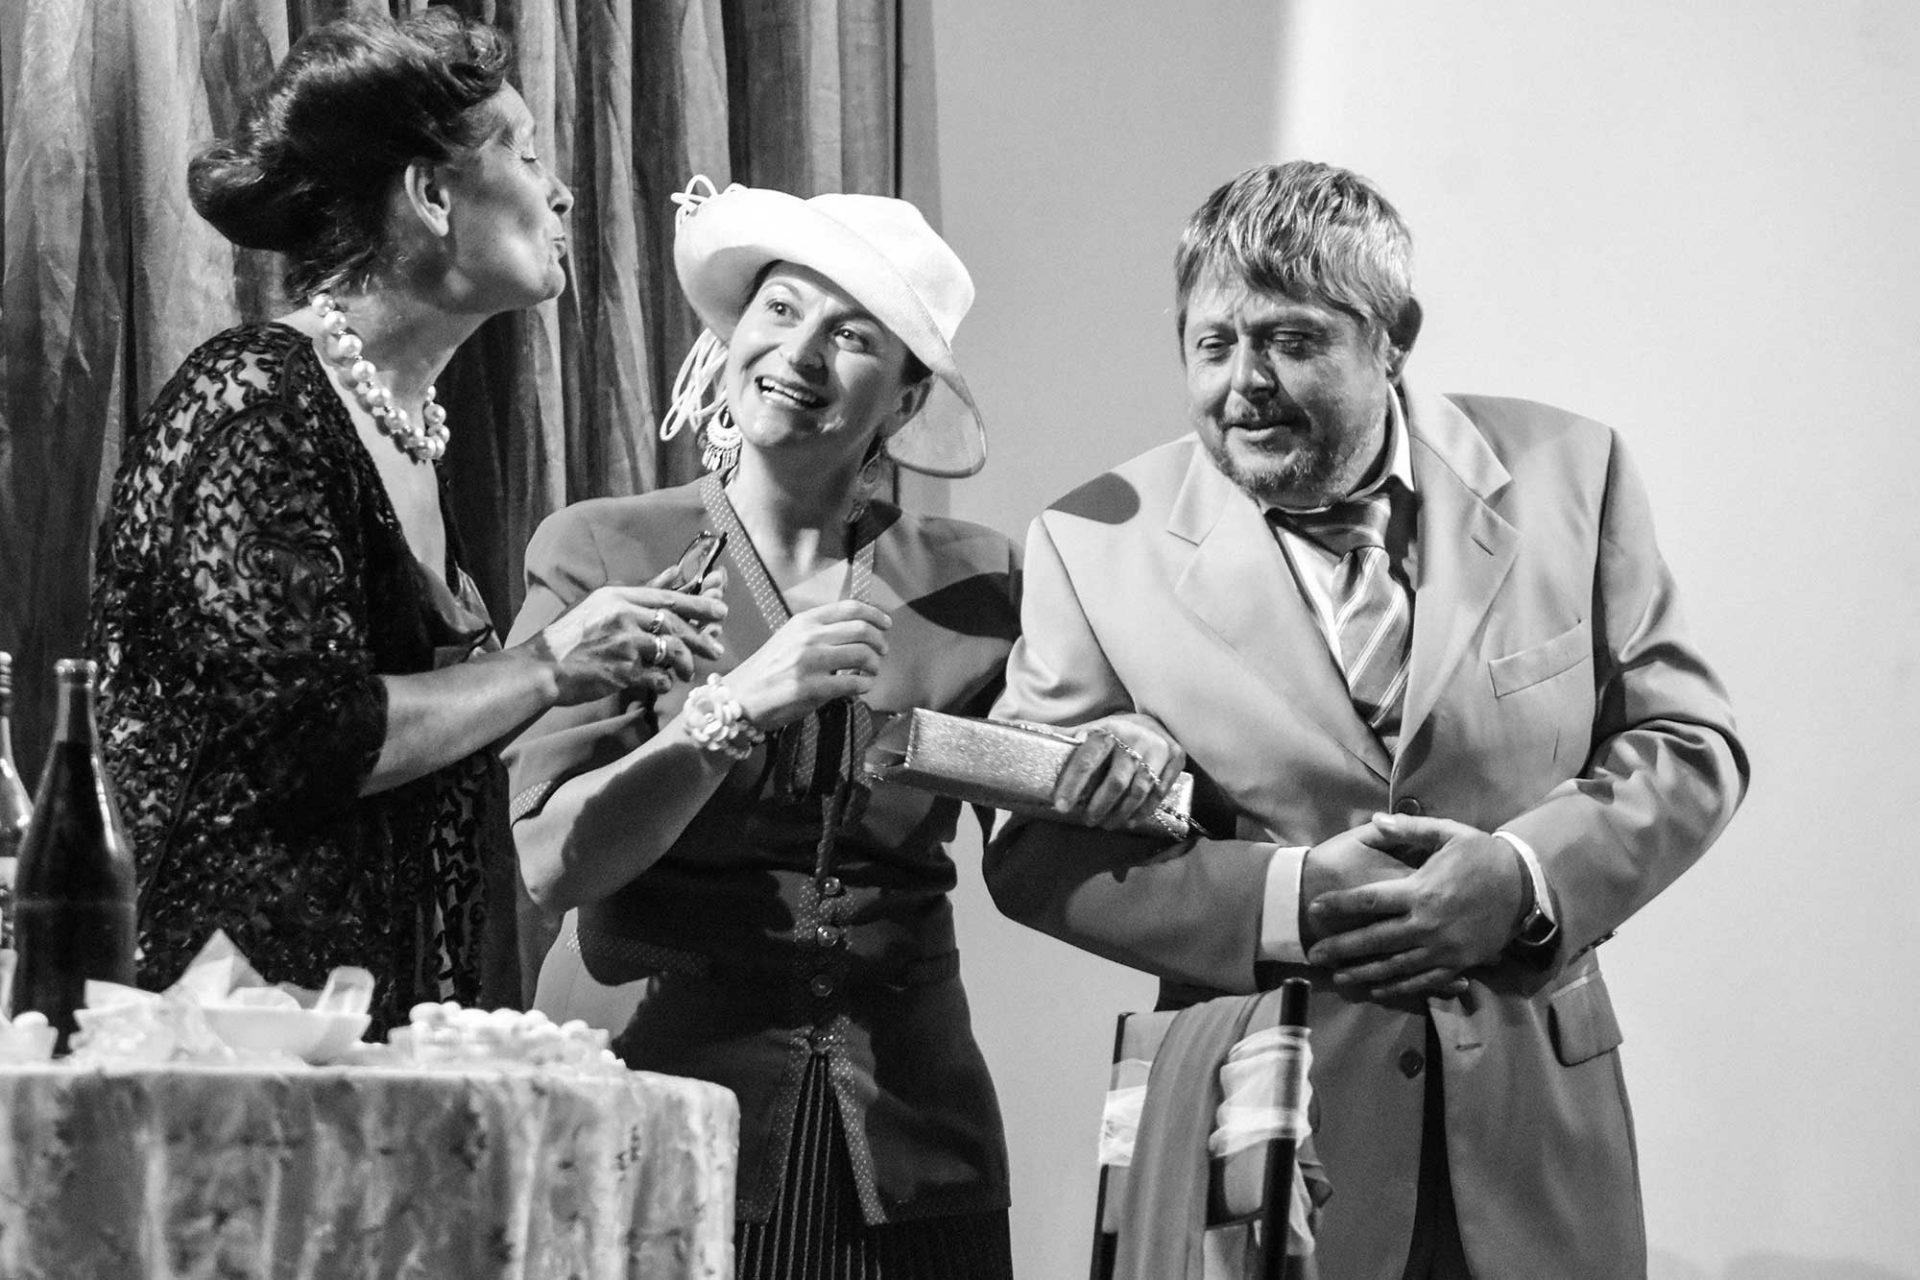 teatro-dialettale-lu-lette-gna-te-le-fie-marrucino-4